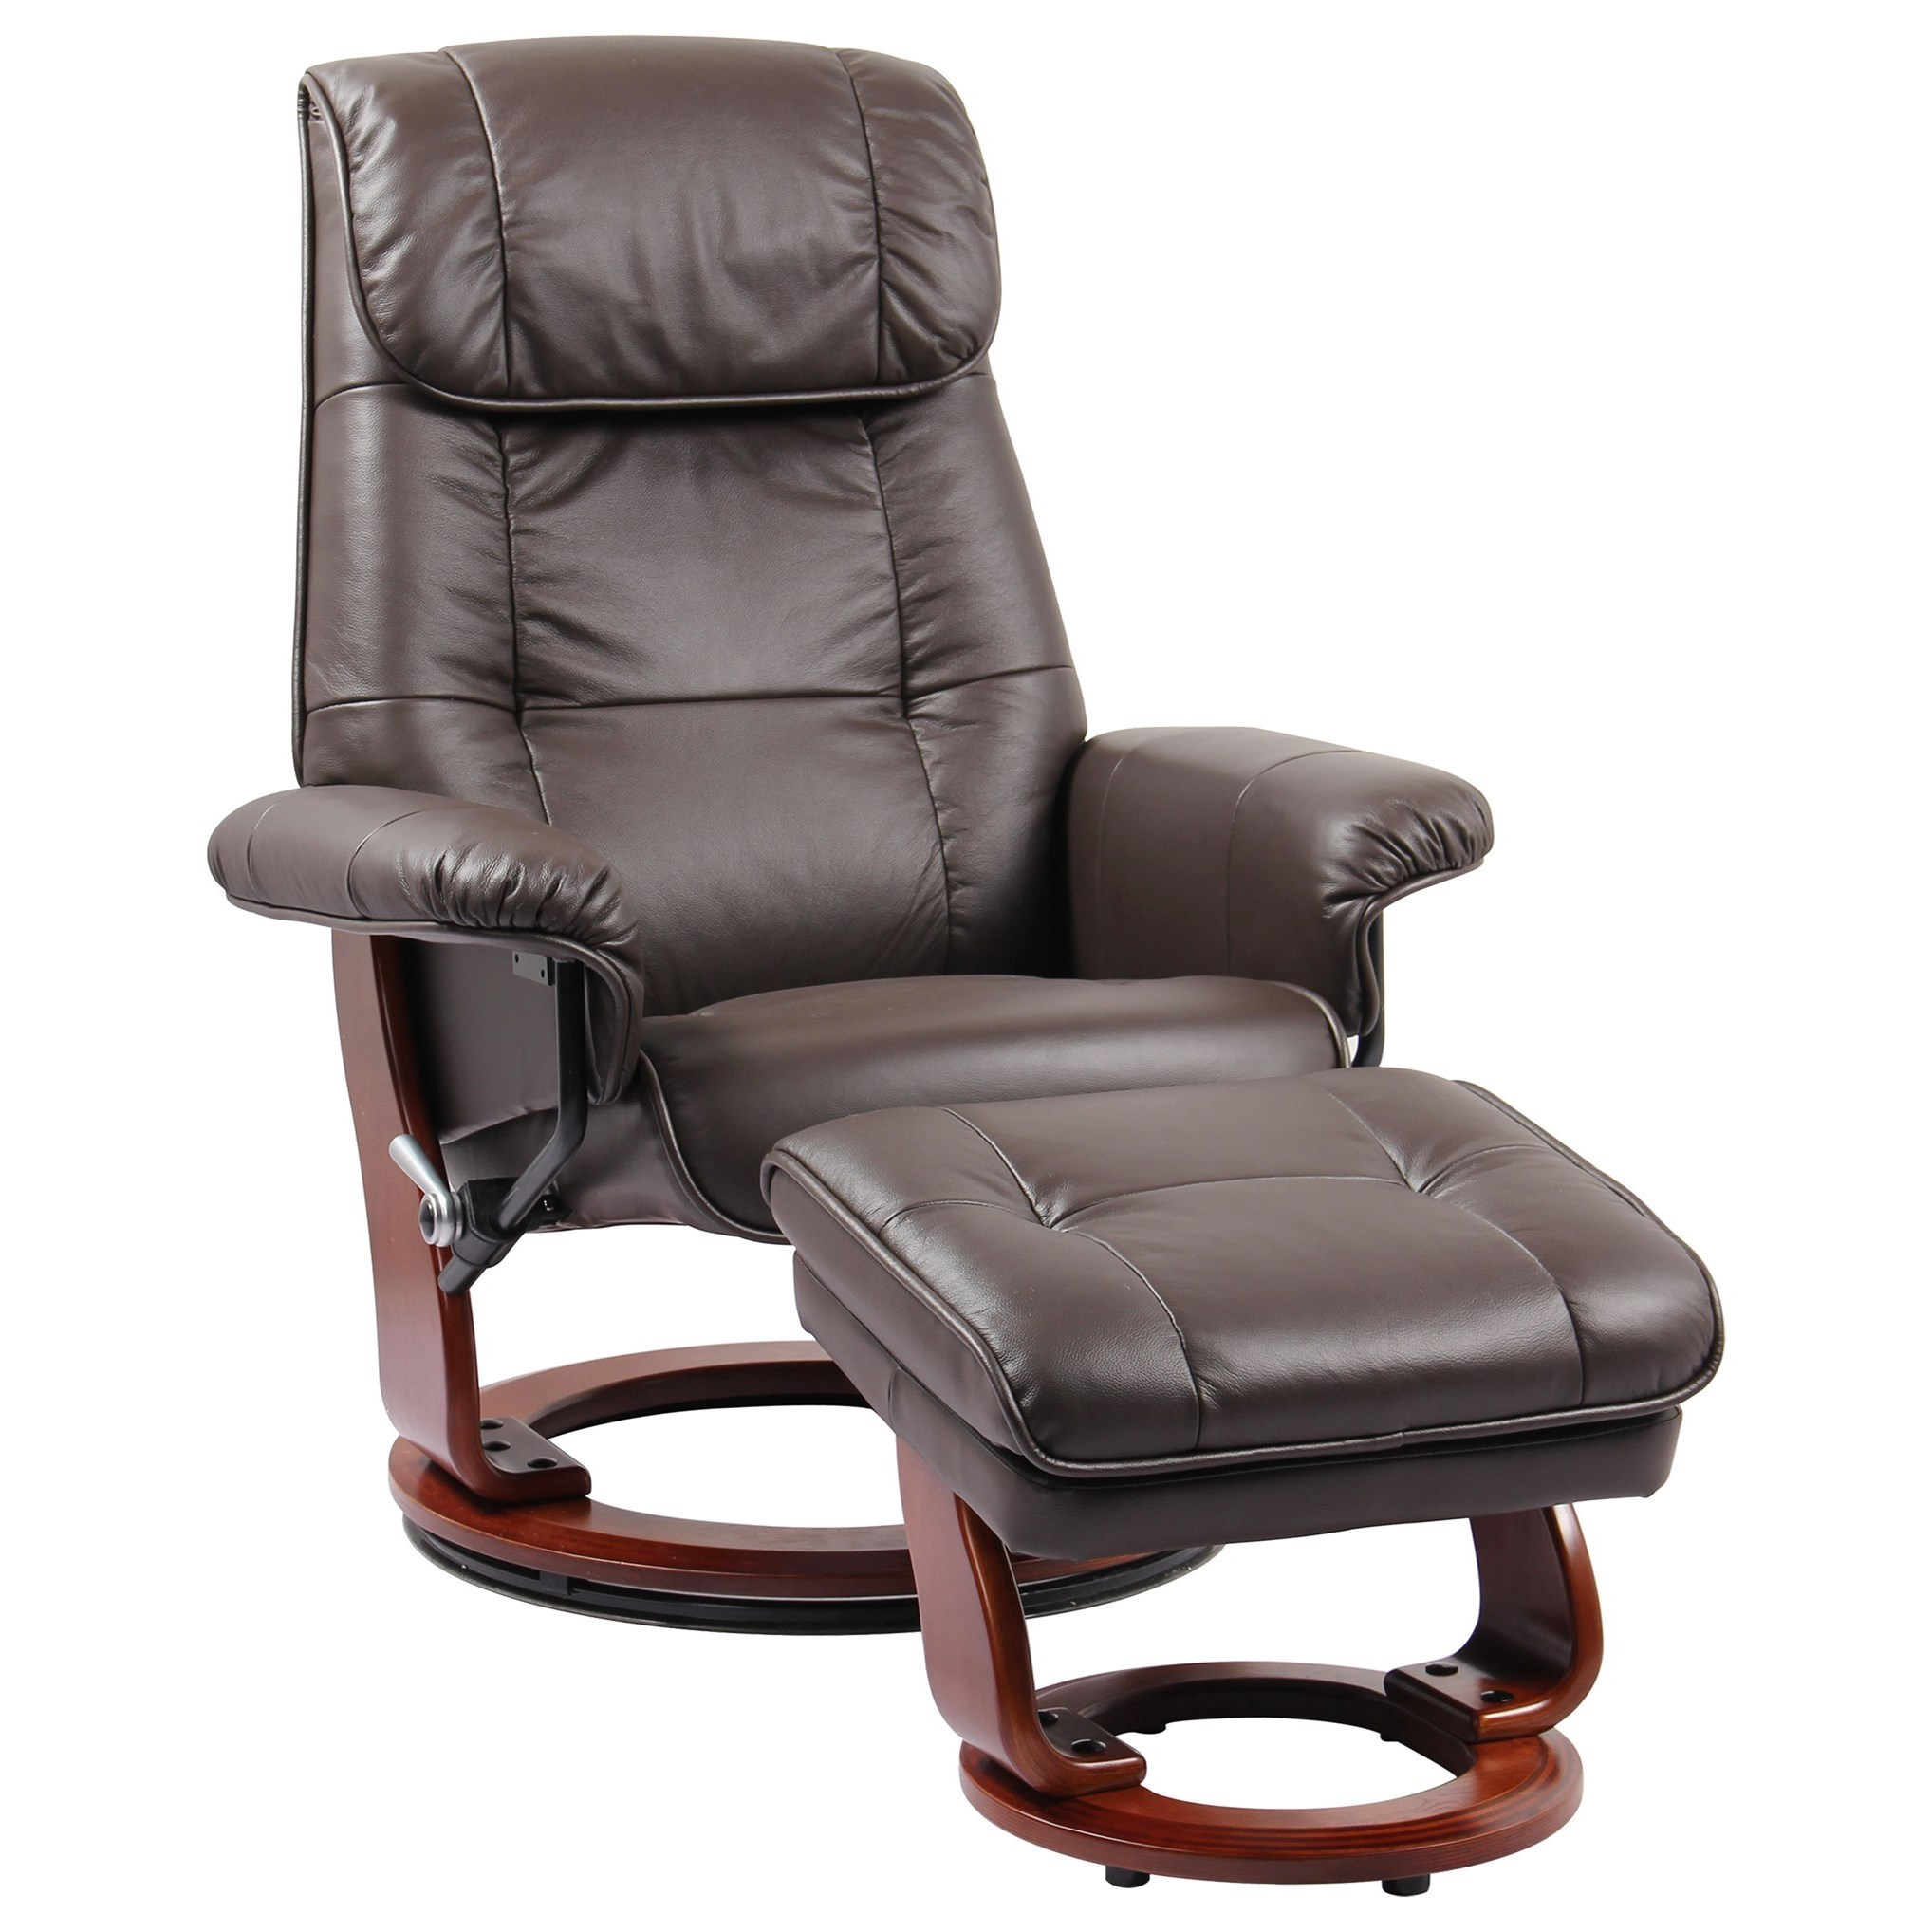 Benchmaster Ventura II Reclining Chair And Ottoman